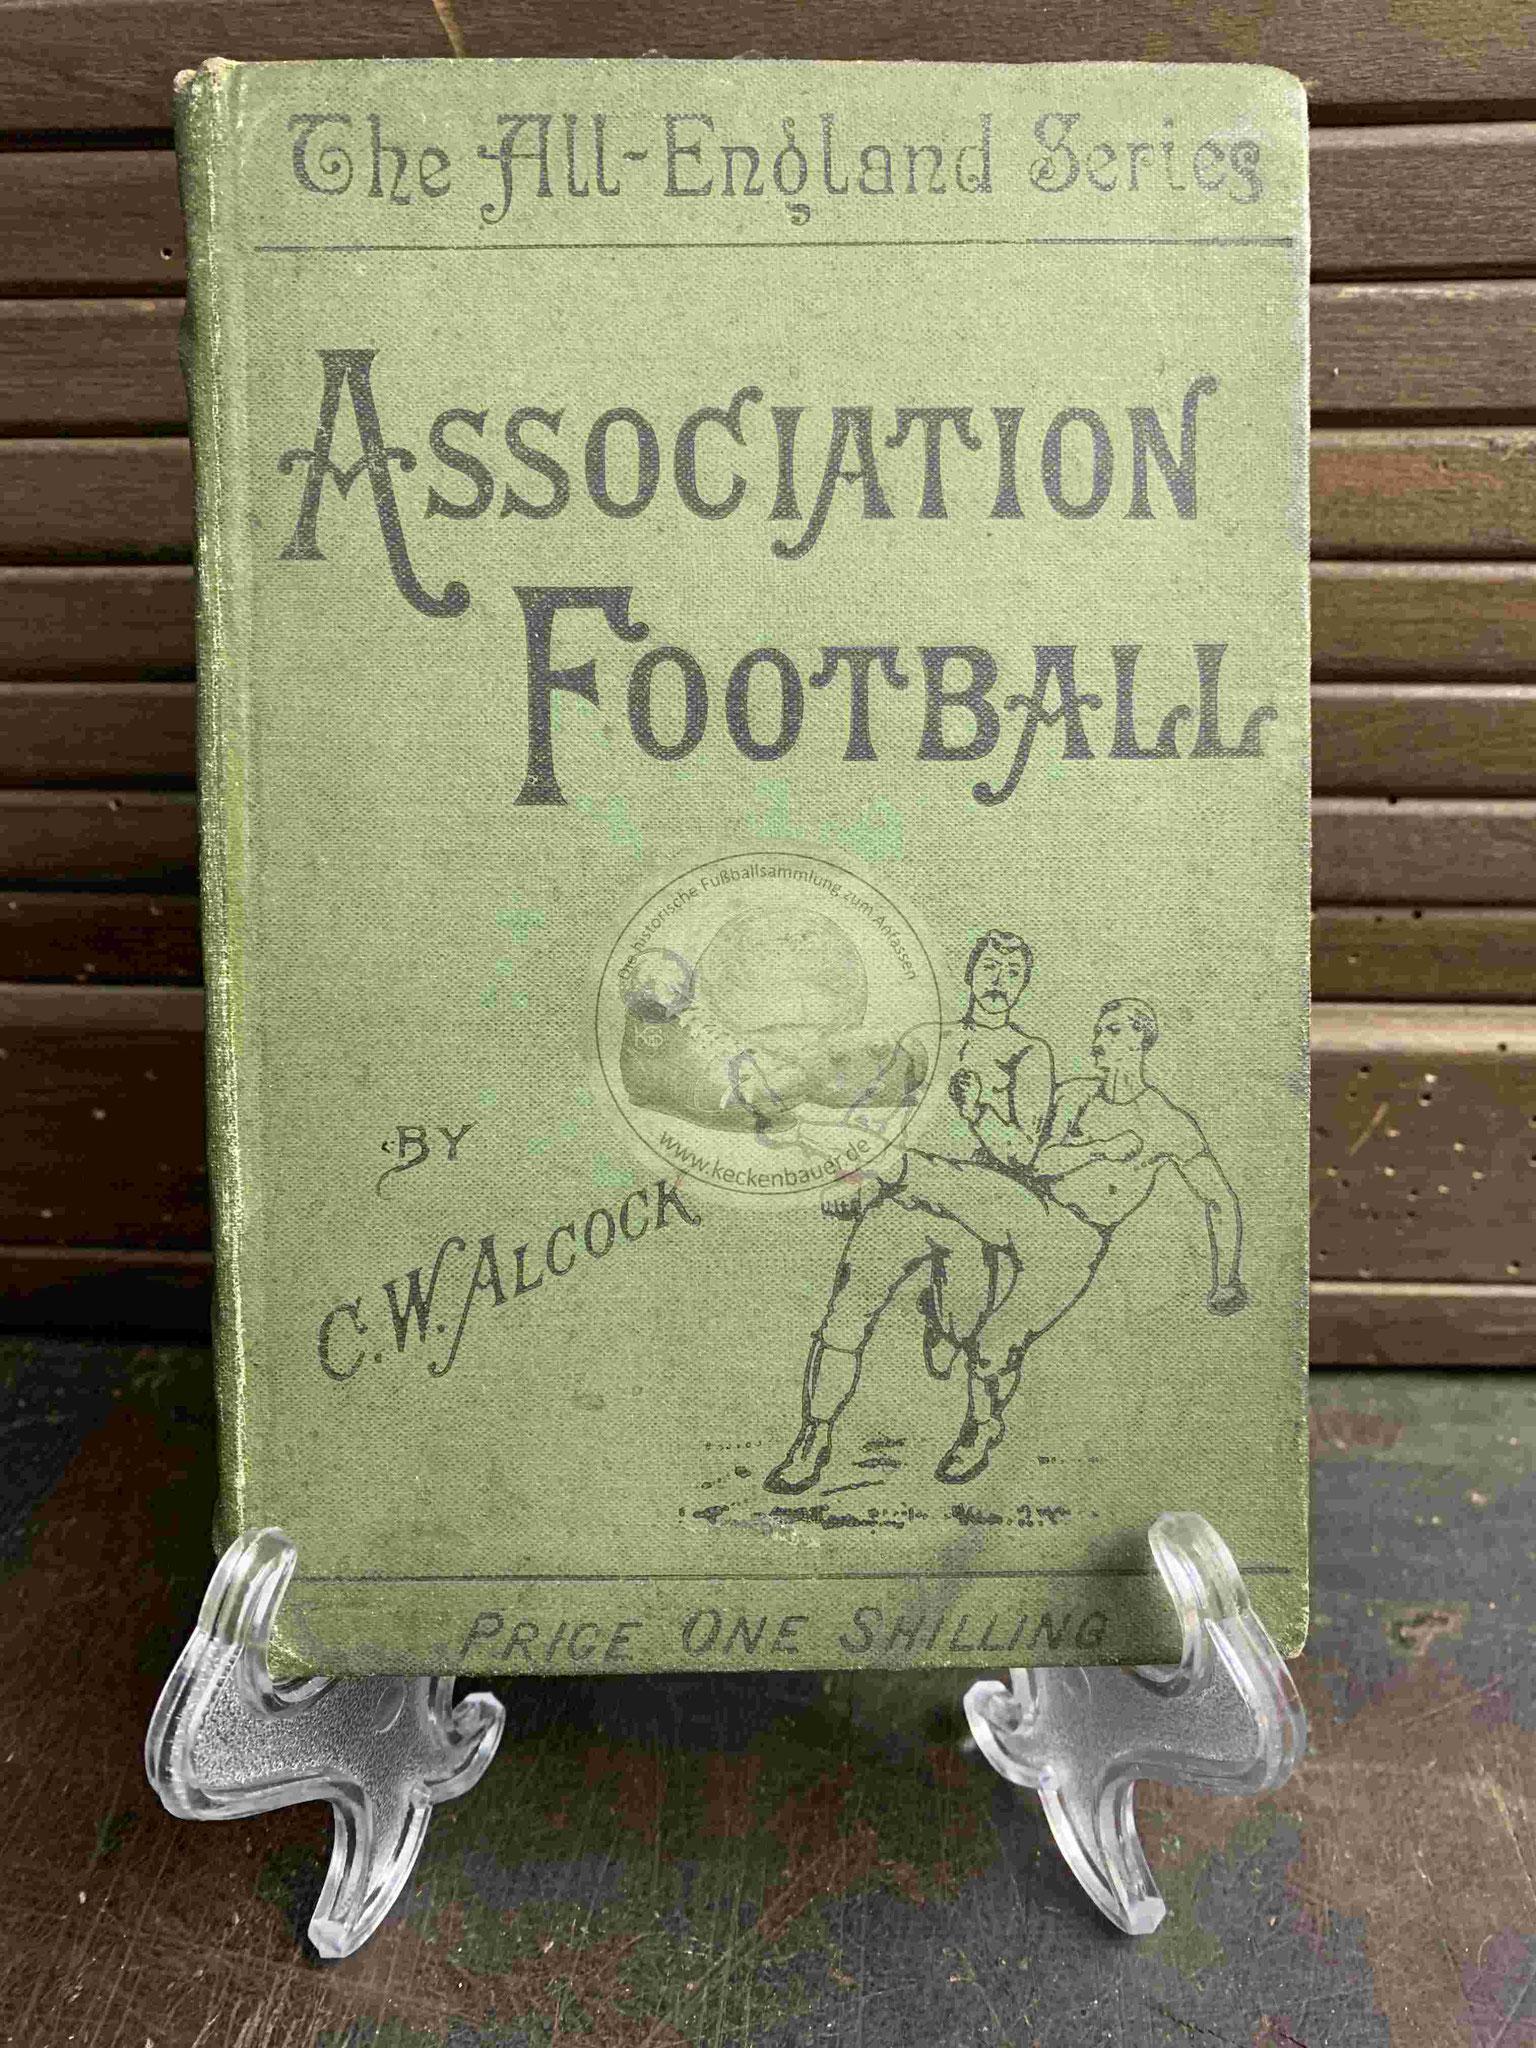 The All-England Series Association Football by C.W. Alcock aus dem Jahr 1902